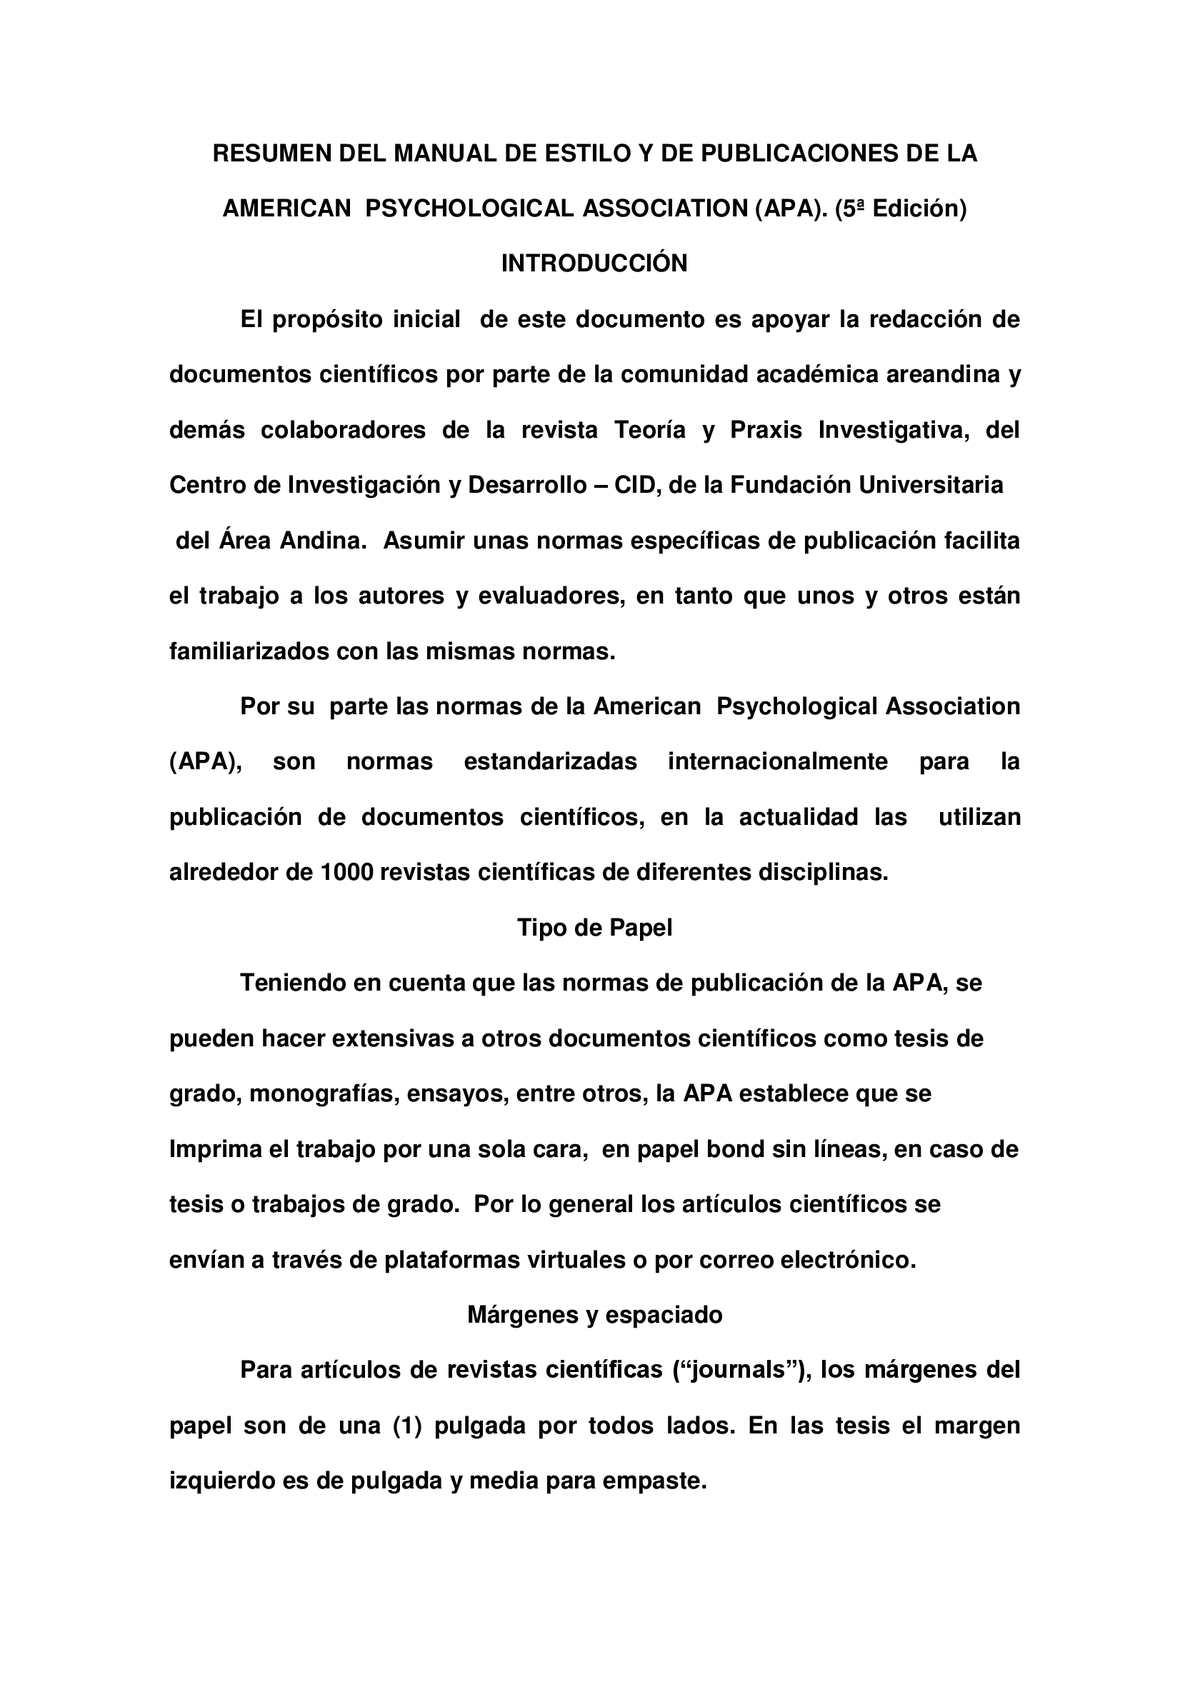 Calaméo - Resumen Normas APA